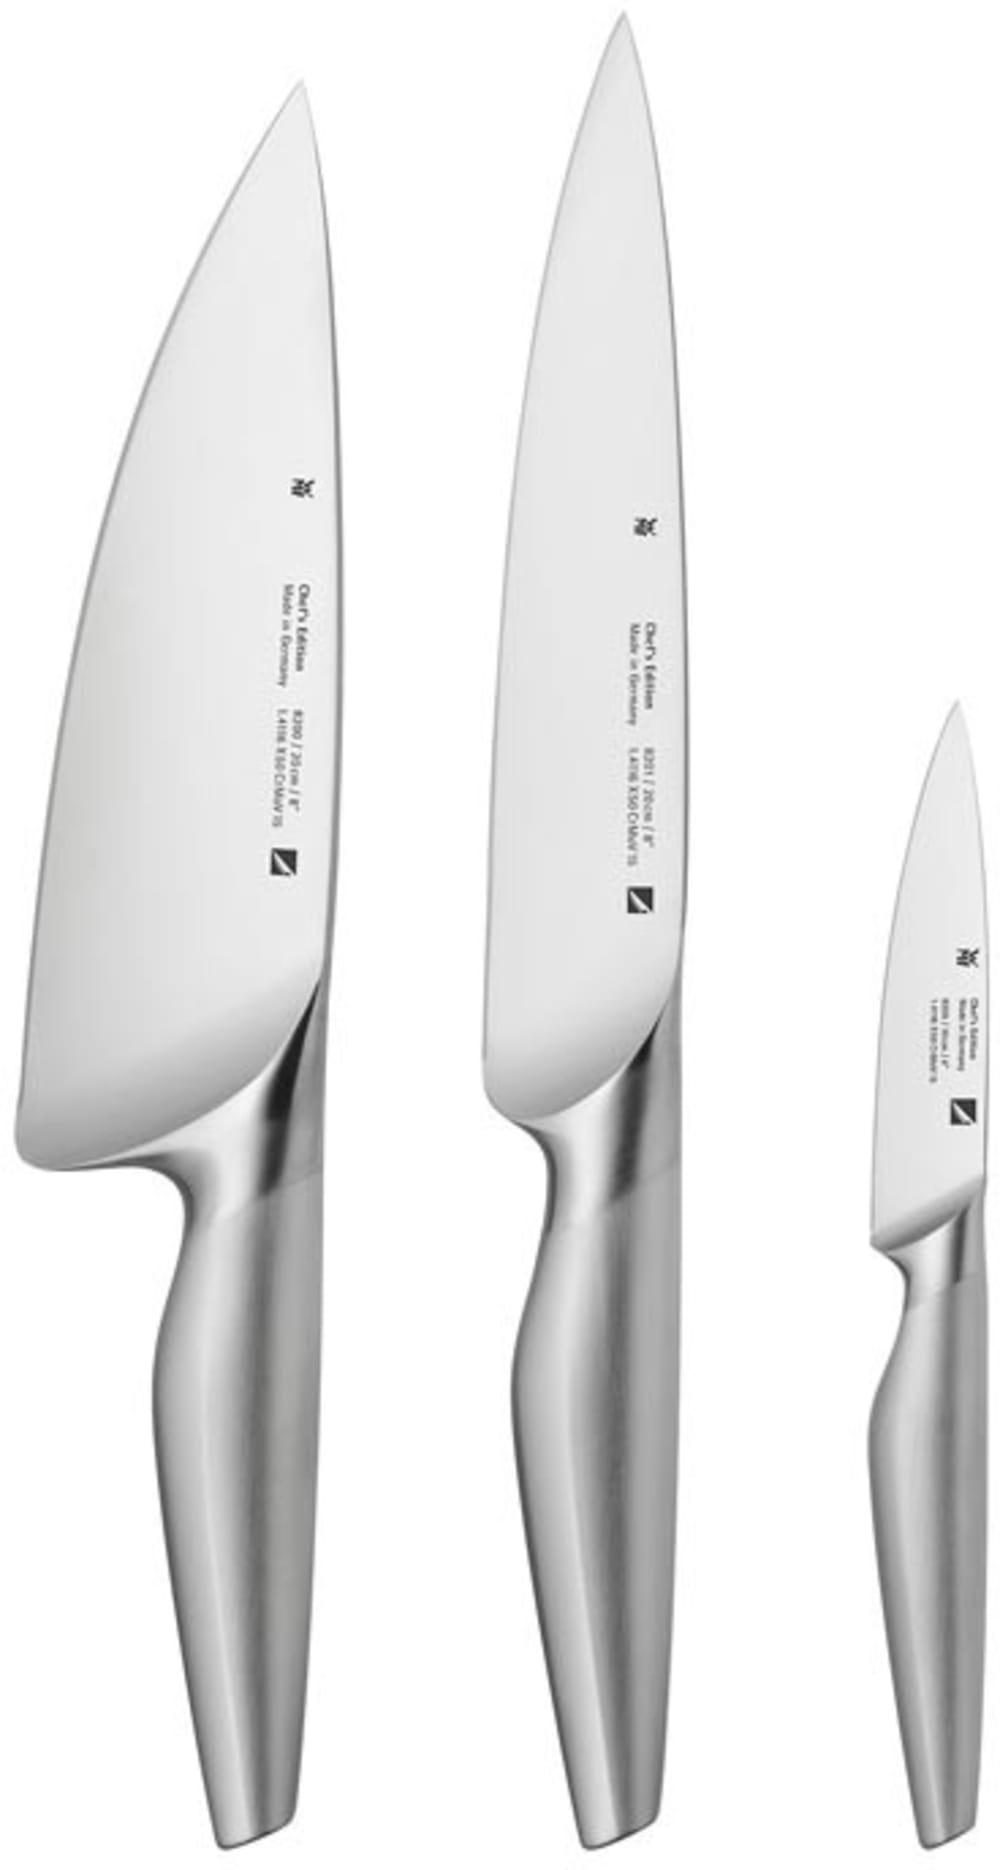 Zestaw 3 noży, Chef's Edition